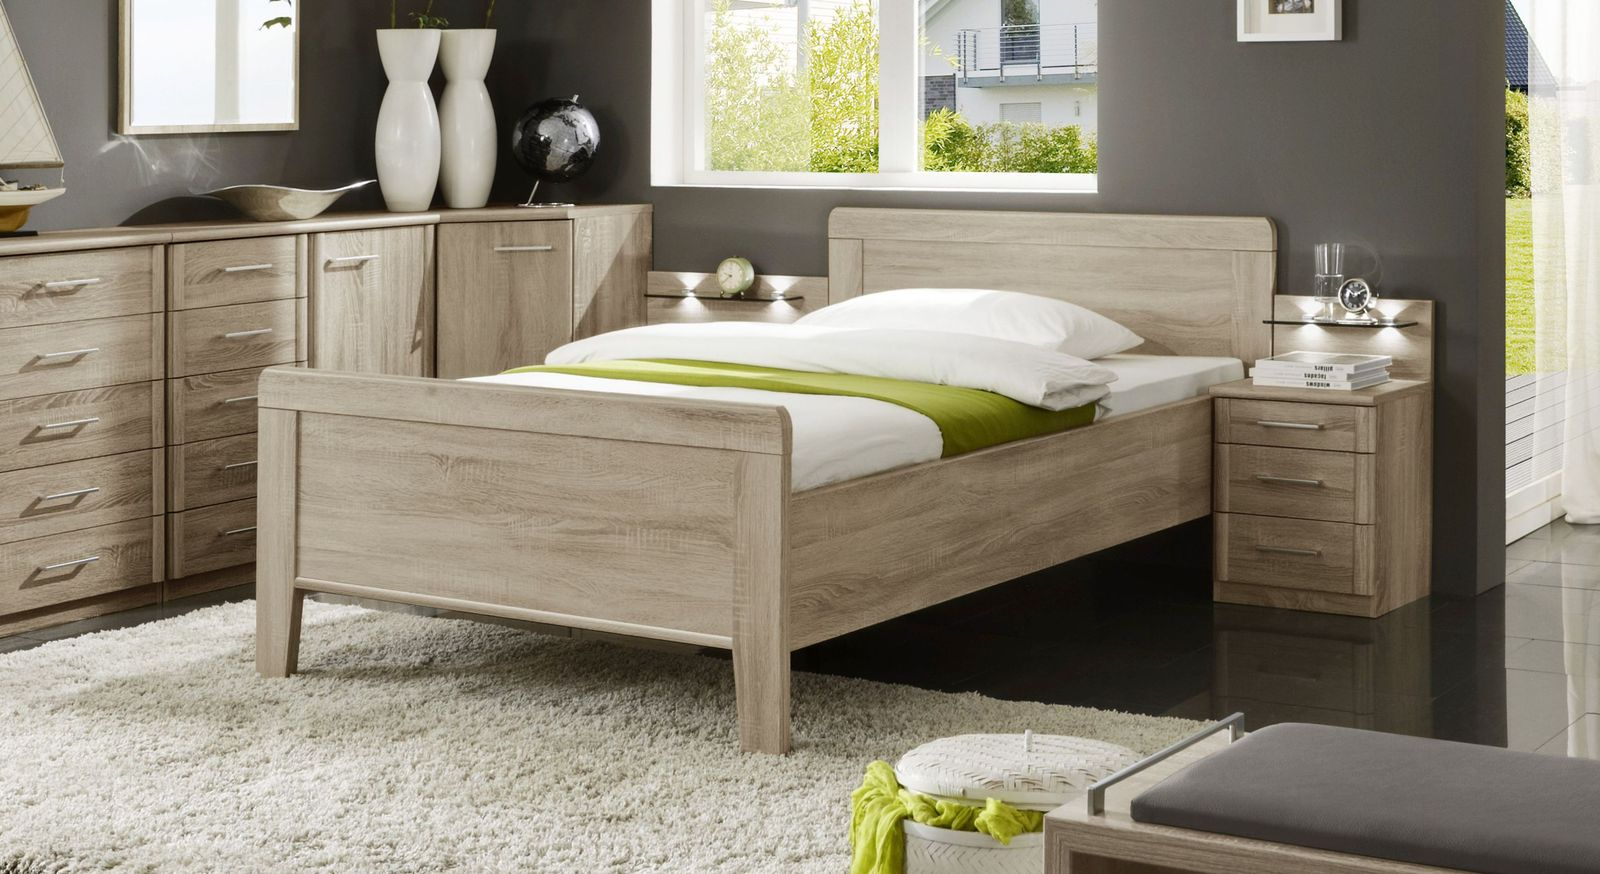 Preiswertes Seniorenbett Palmira in dezentem Design